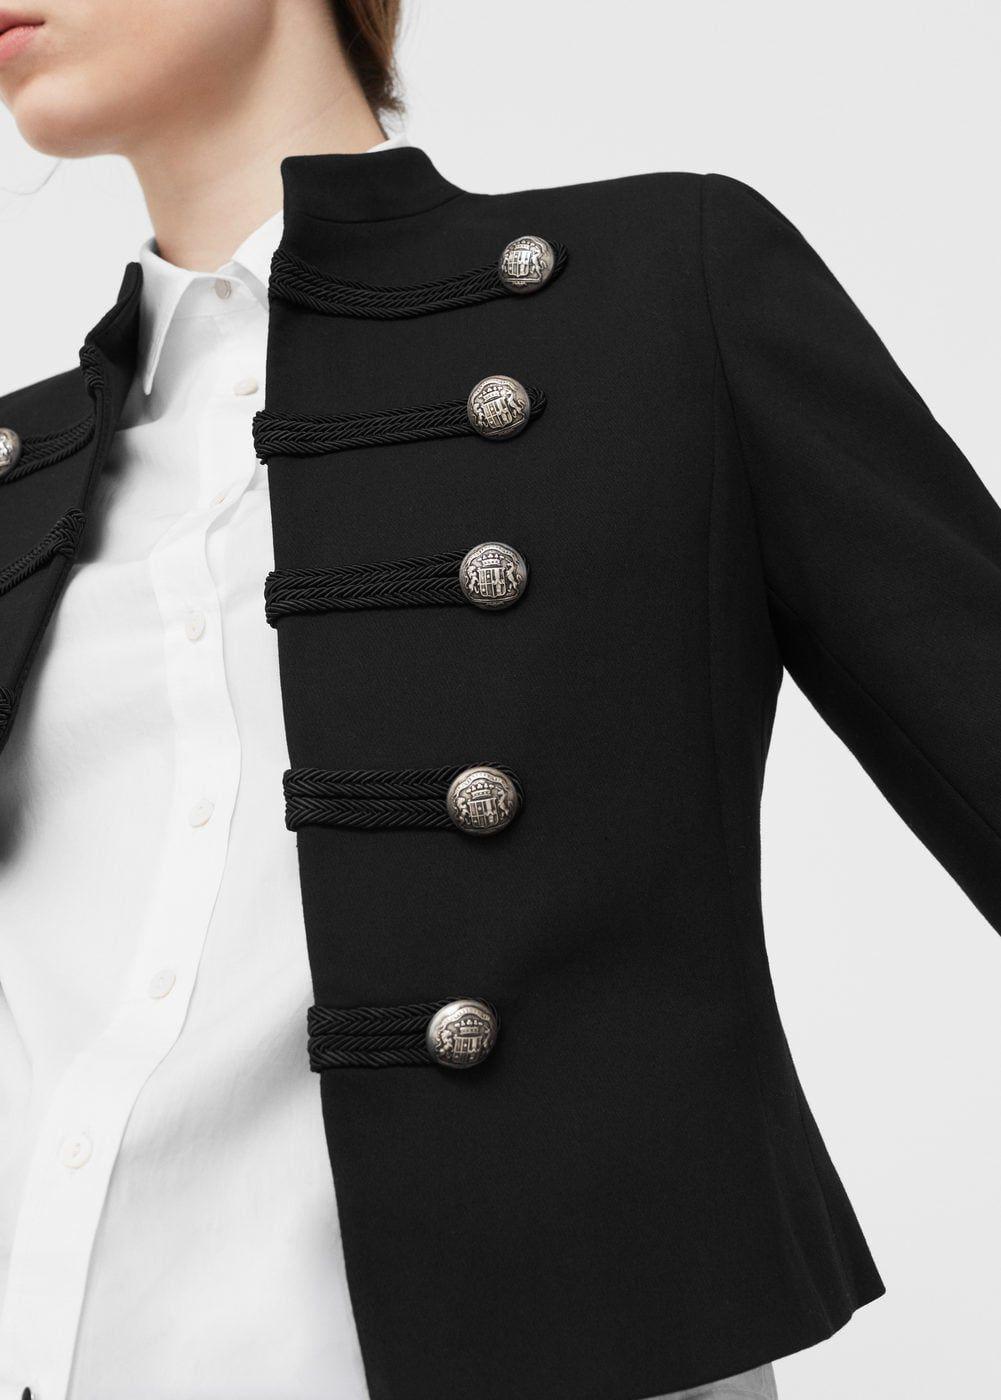 Veste style militaire - Femme   Fashion   Military fashion, Military ... e82dcc6e8138